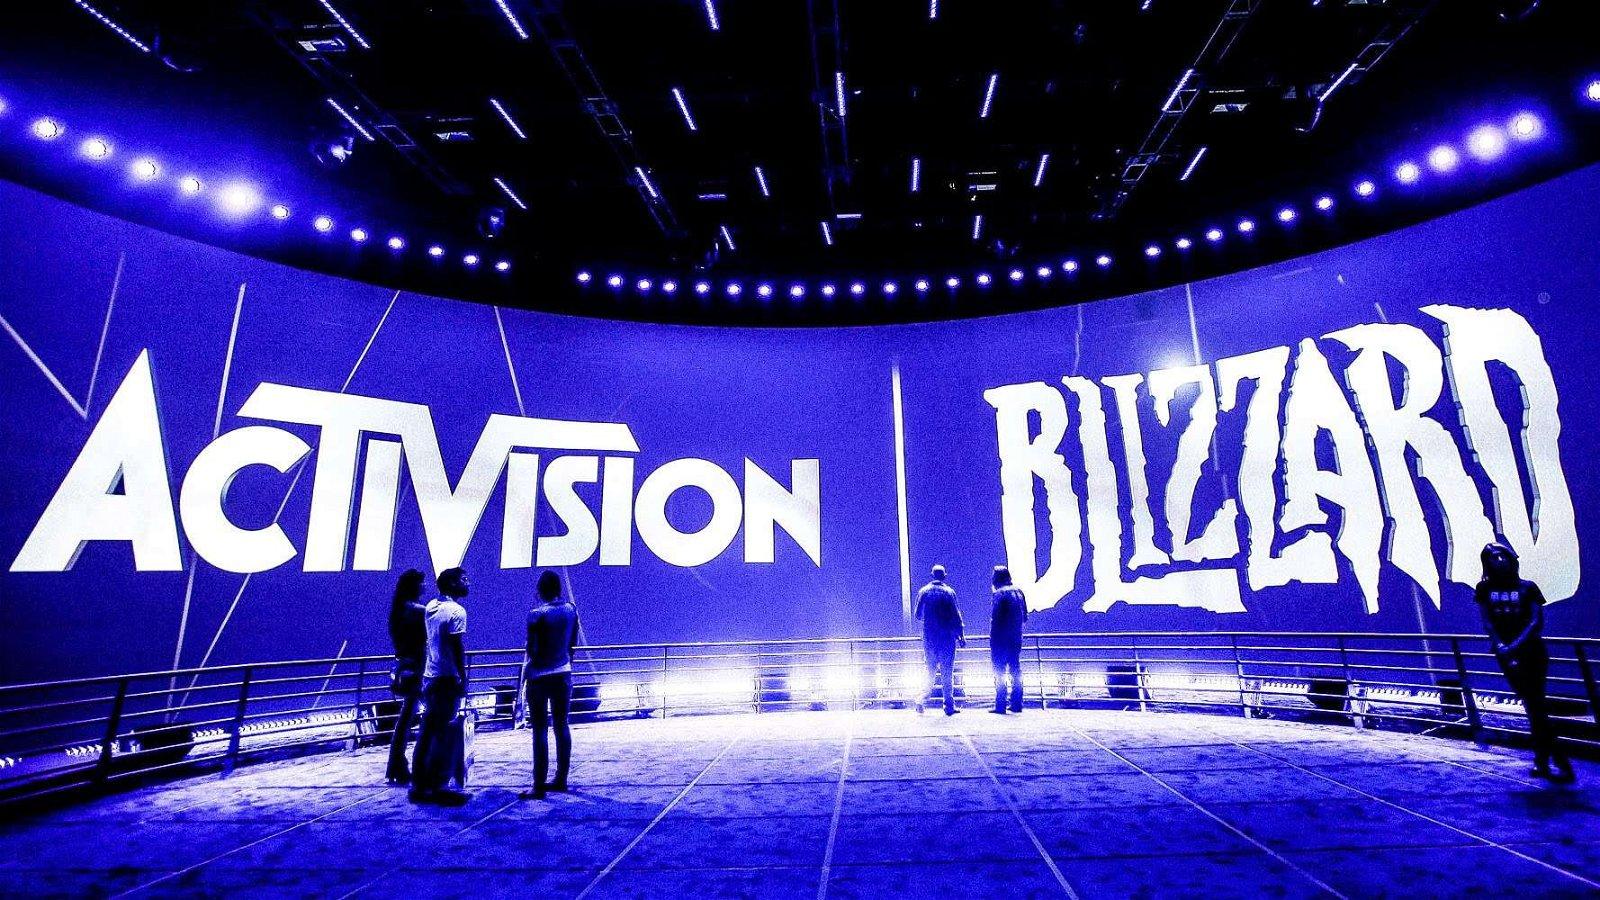 Activision Blizzard Re-Appoints Dennis Durkin Chief Financial Officer 1